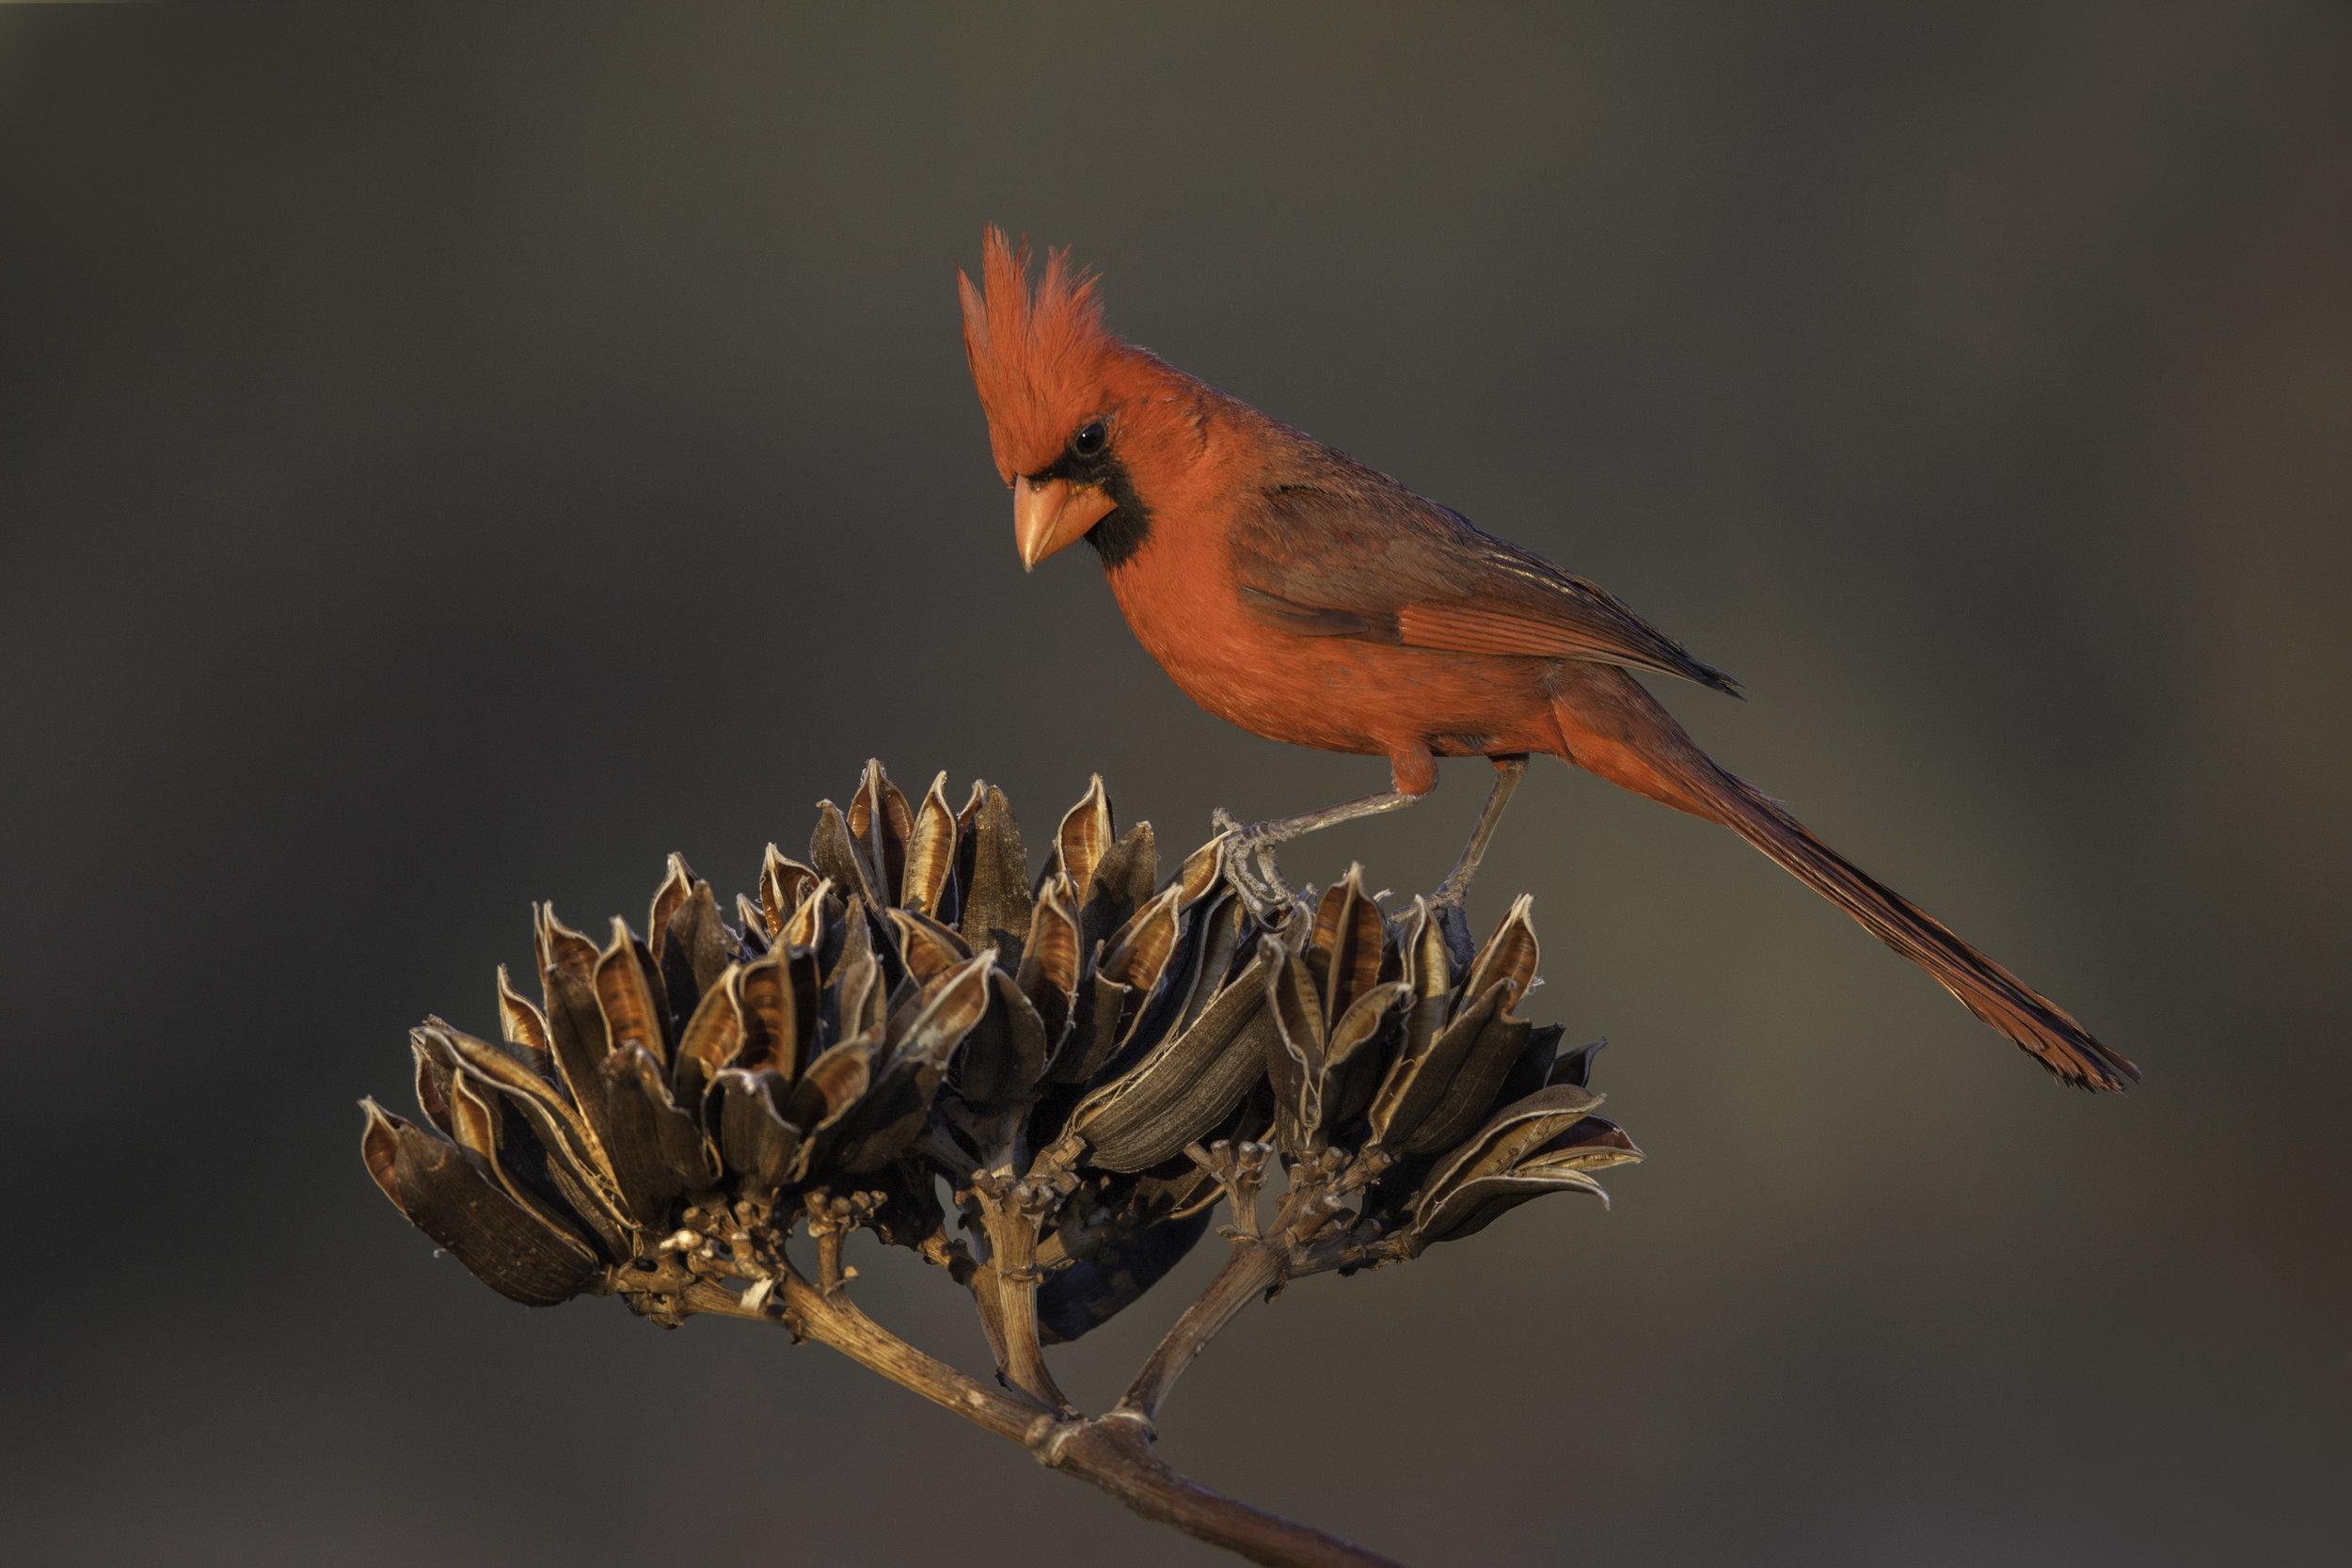 northern_cardinal_8251.jpg